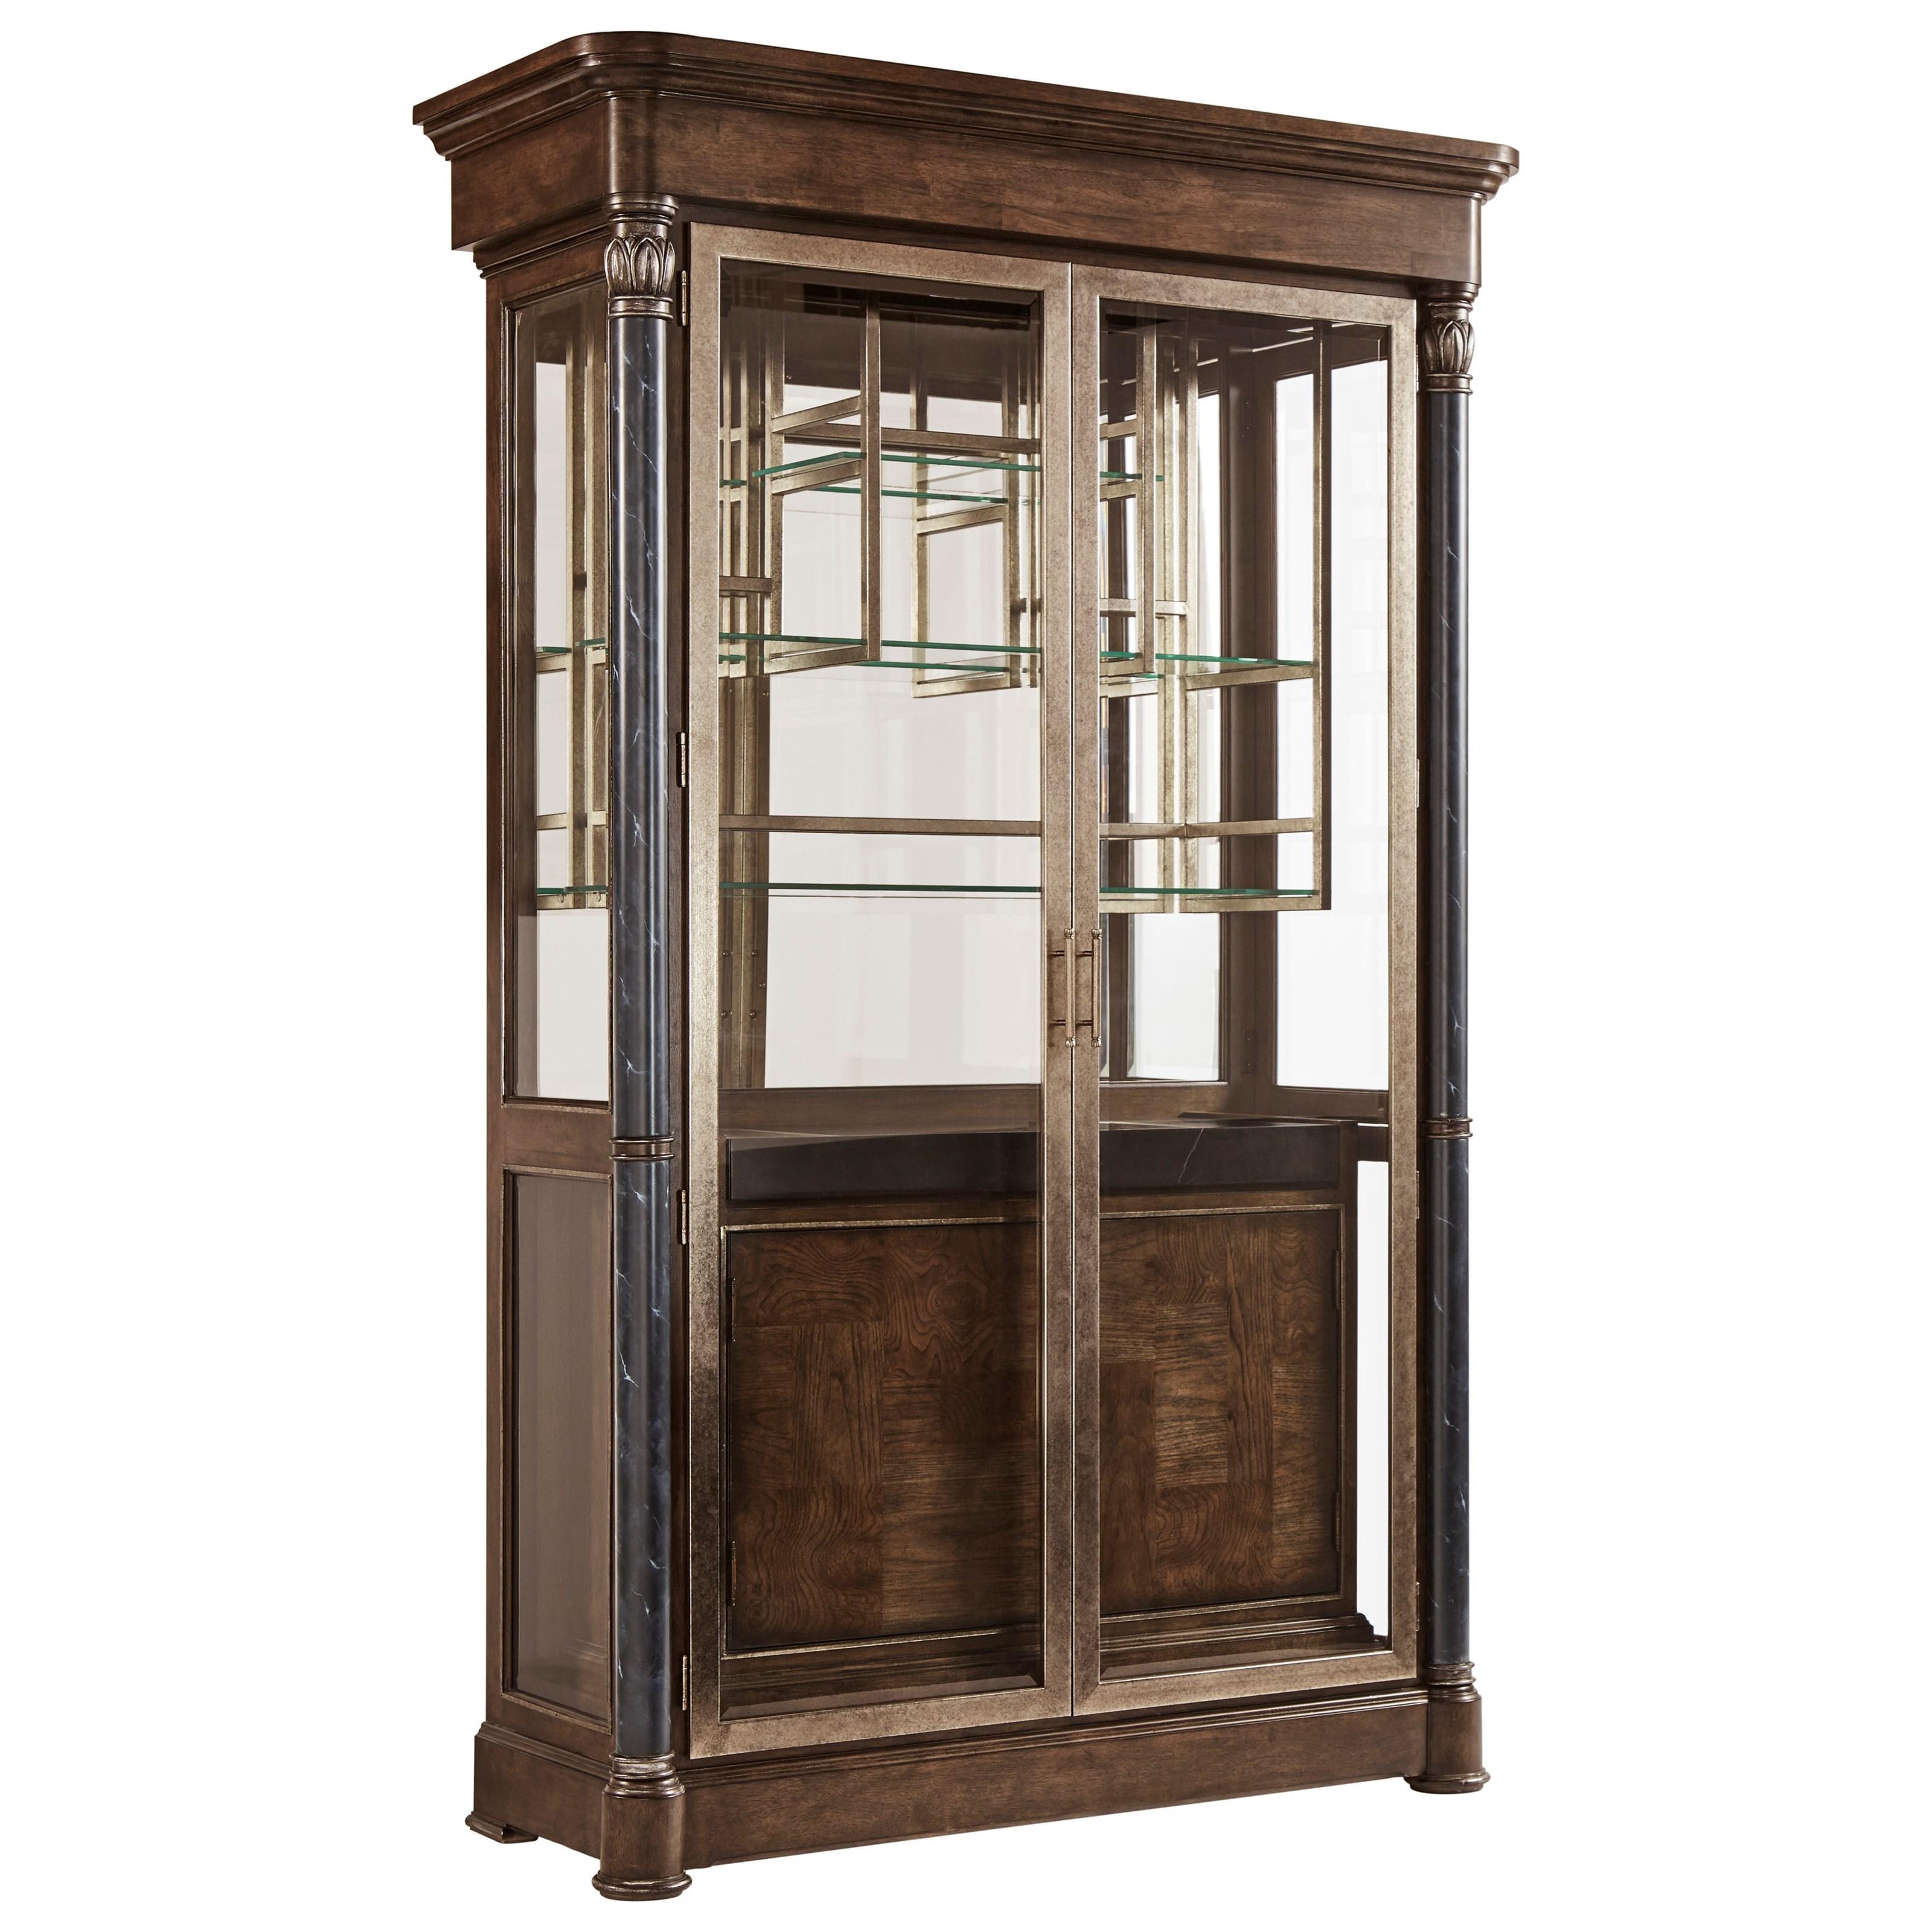 Landmark Display Cabinet by A.R.T. Furniture Inc at Michael Alan Furniture & Design